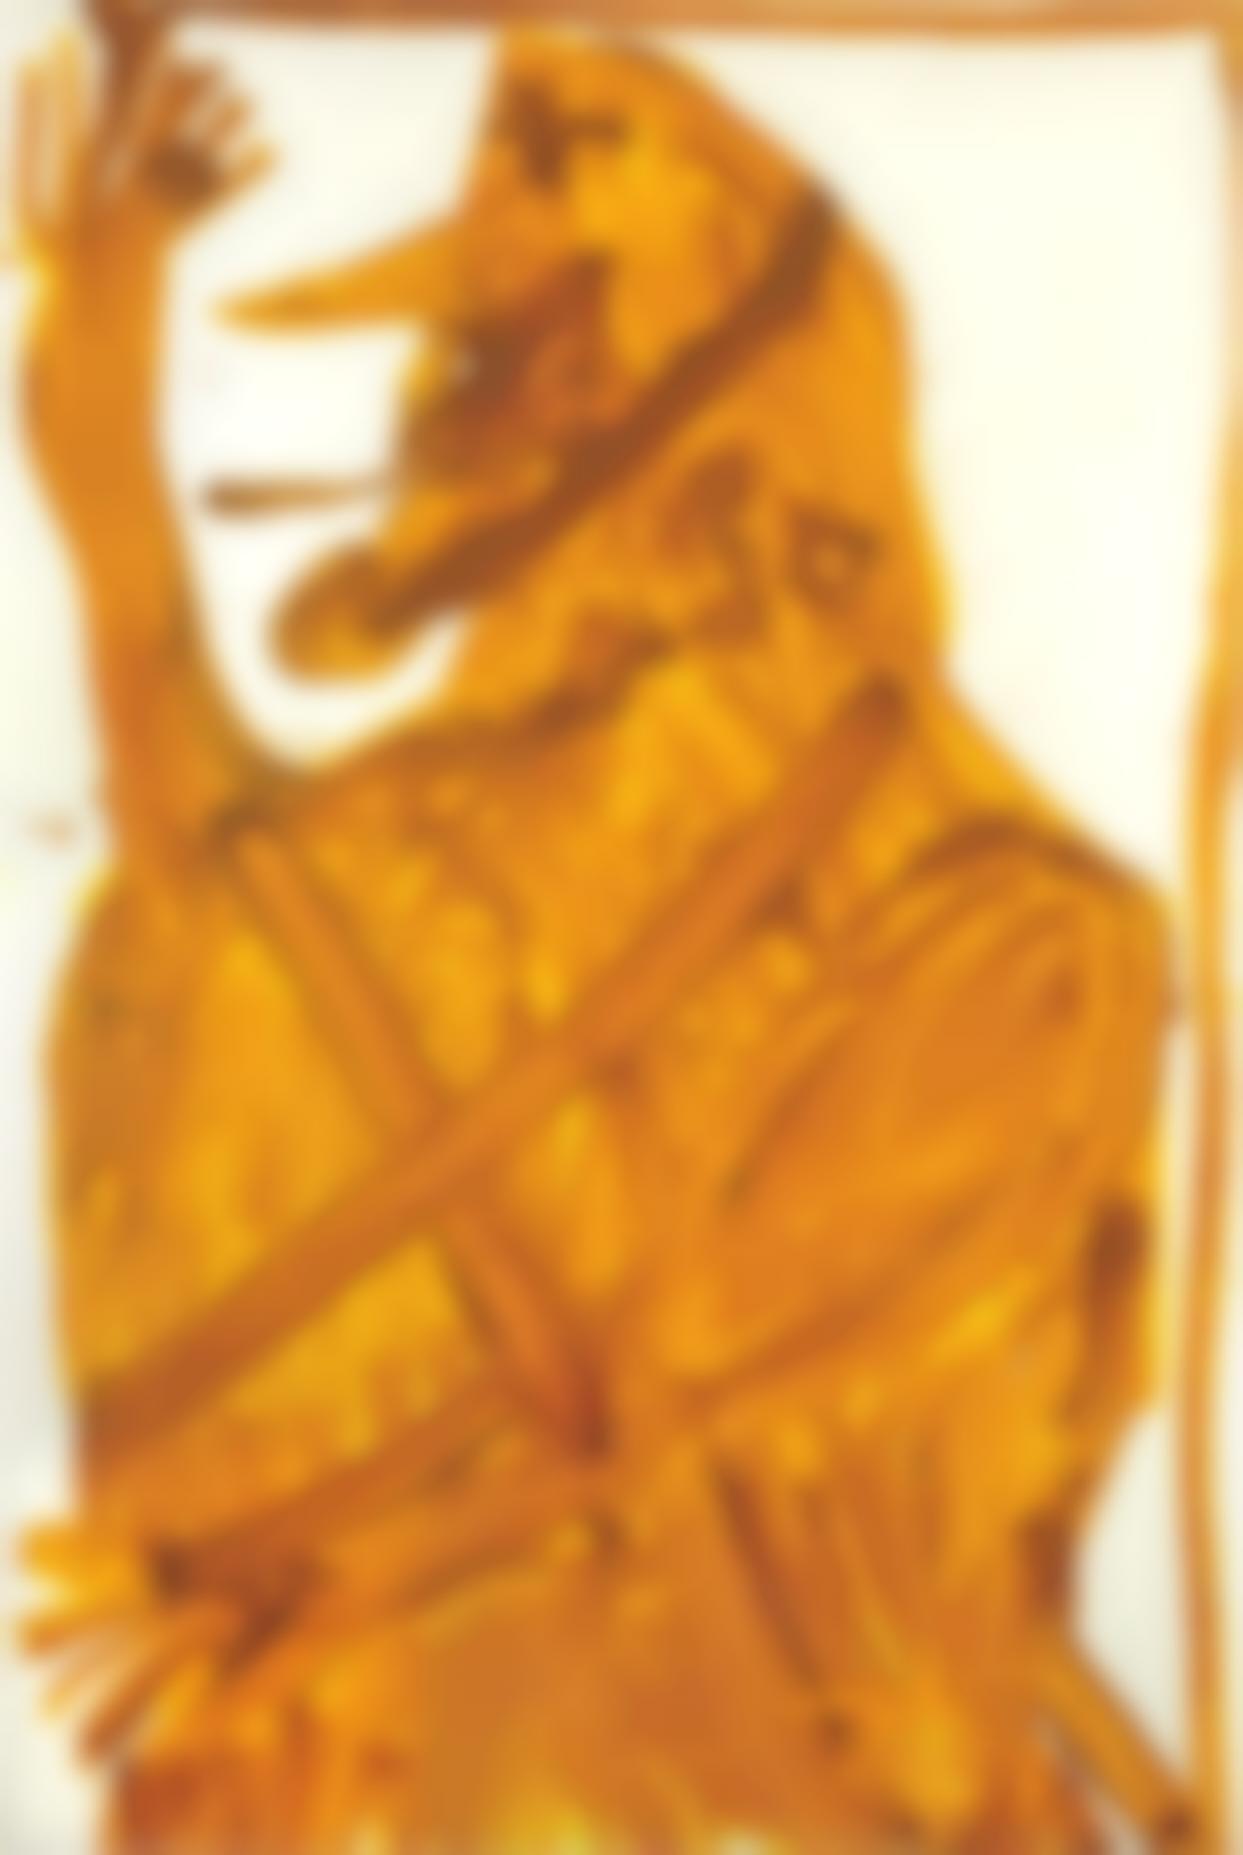 Jonathan Meese-Revolte, 1000 X Keuschheit Goldene Diamantin Die Totalvolkische-2007